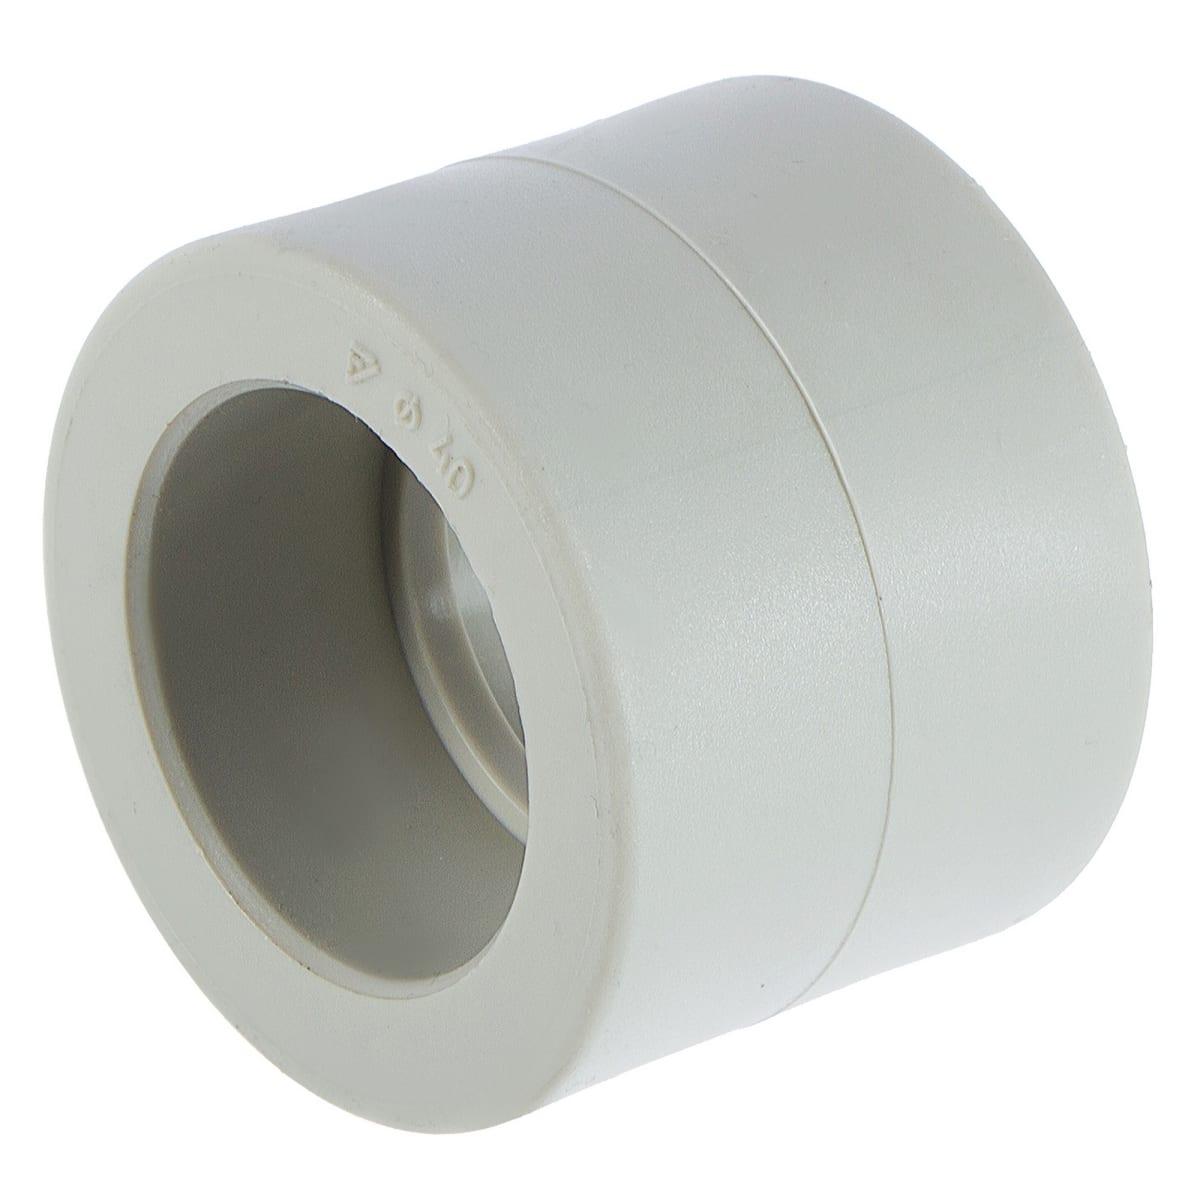 Муфта ⌀40 мм FV-PLAST полипропилен